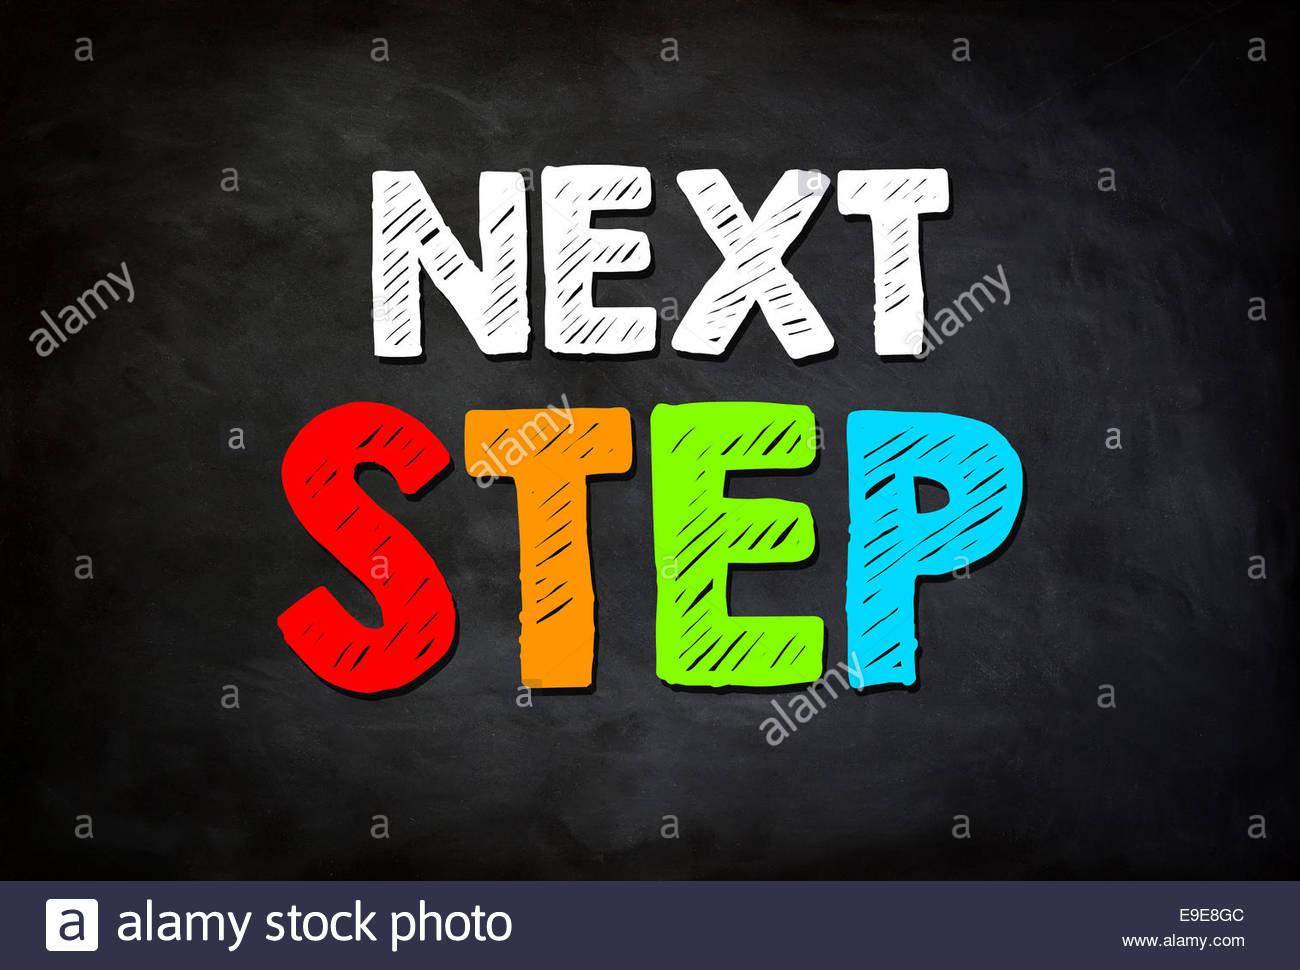 Siguiente paso: Concepto Imagen De Stock